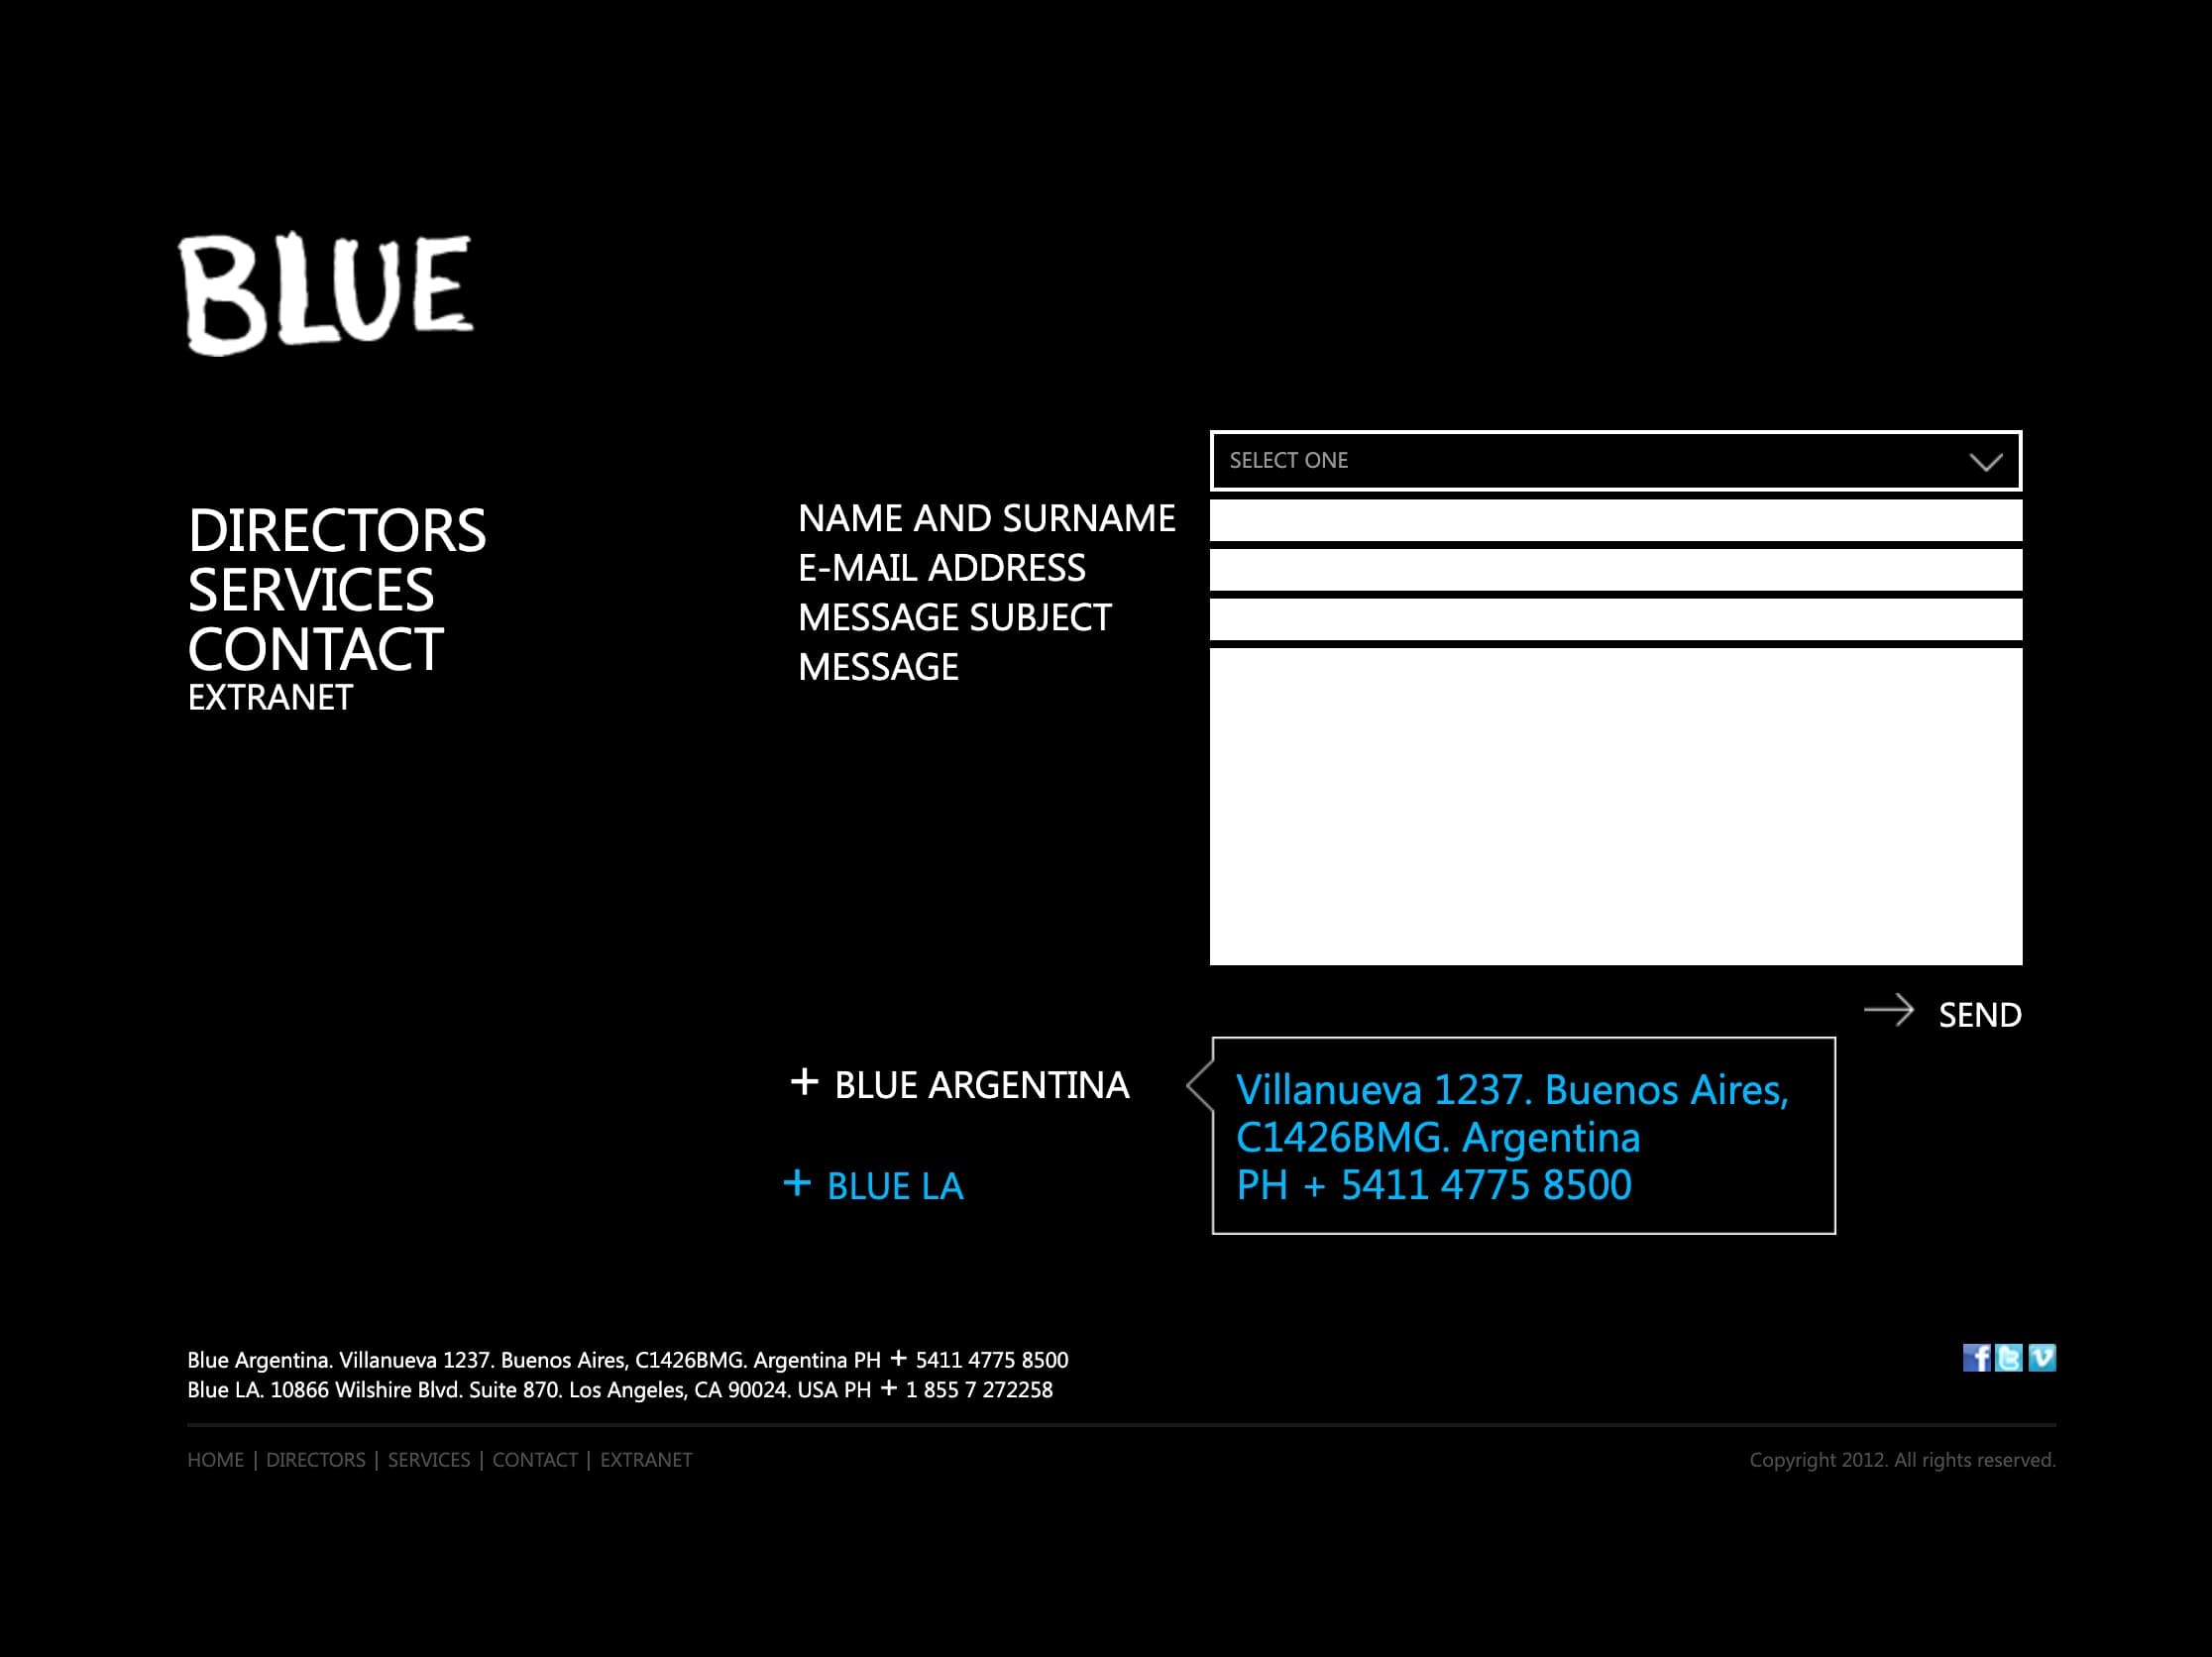 Blue Productora